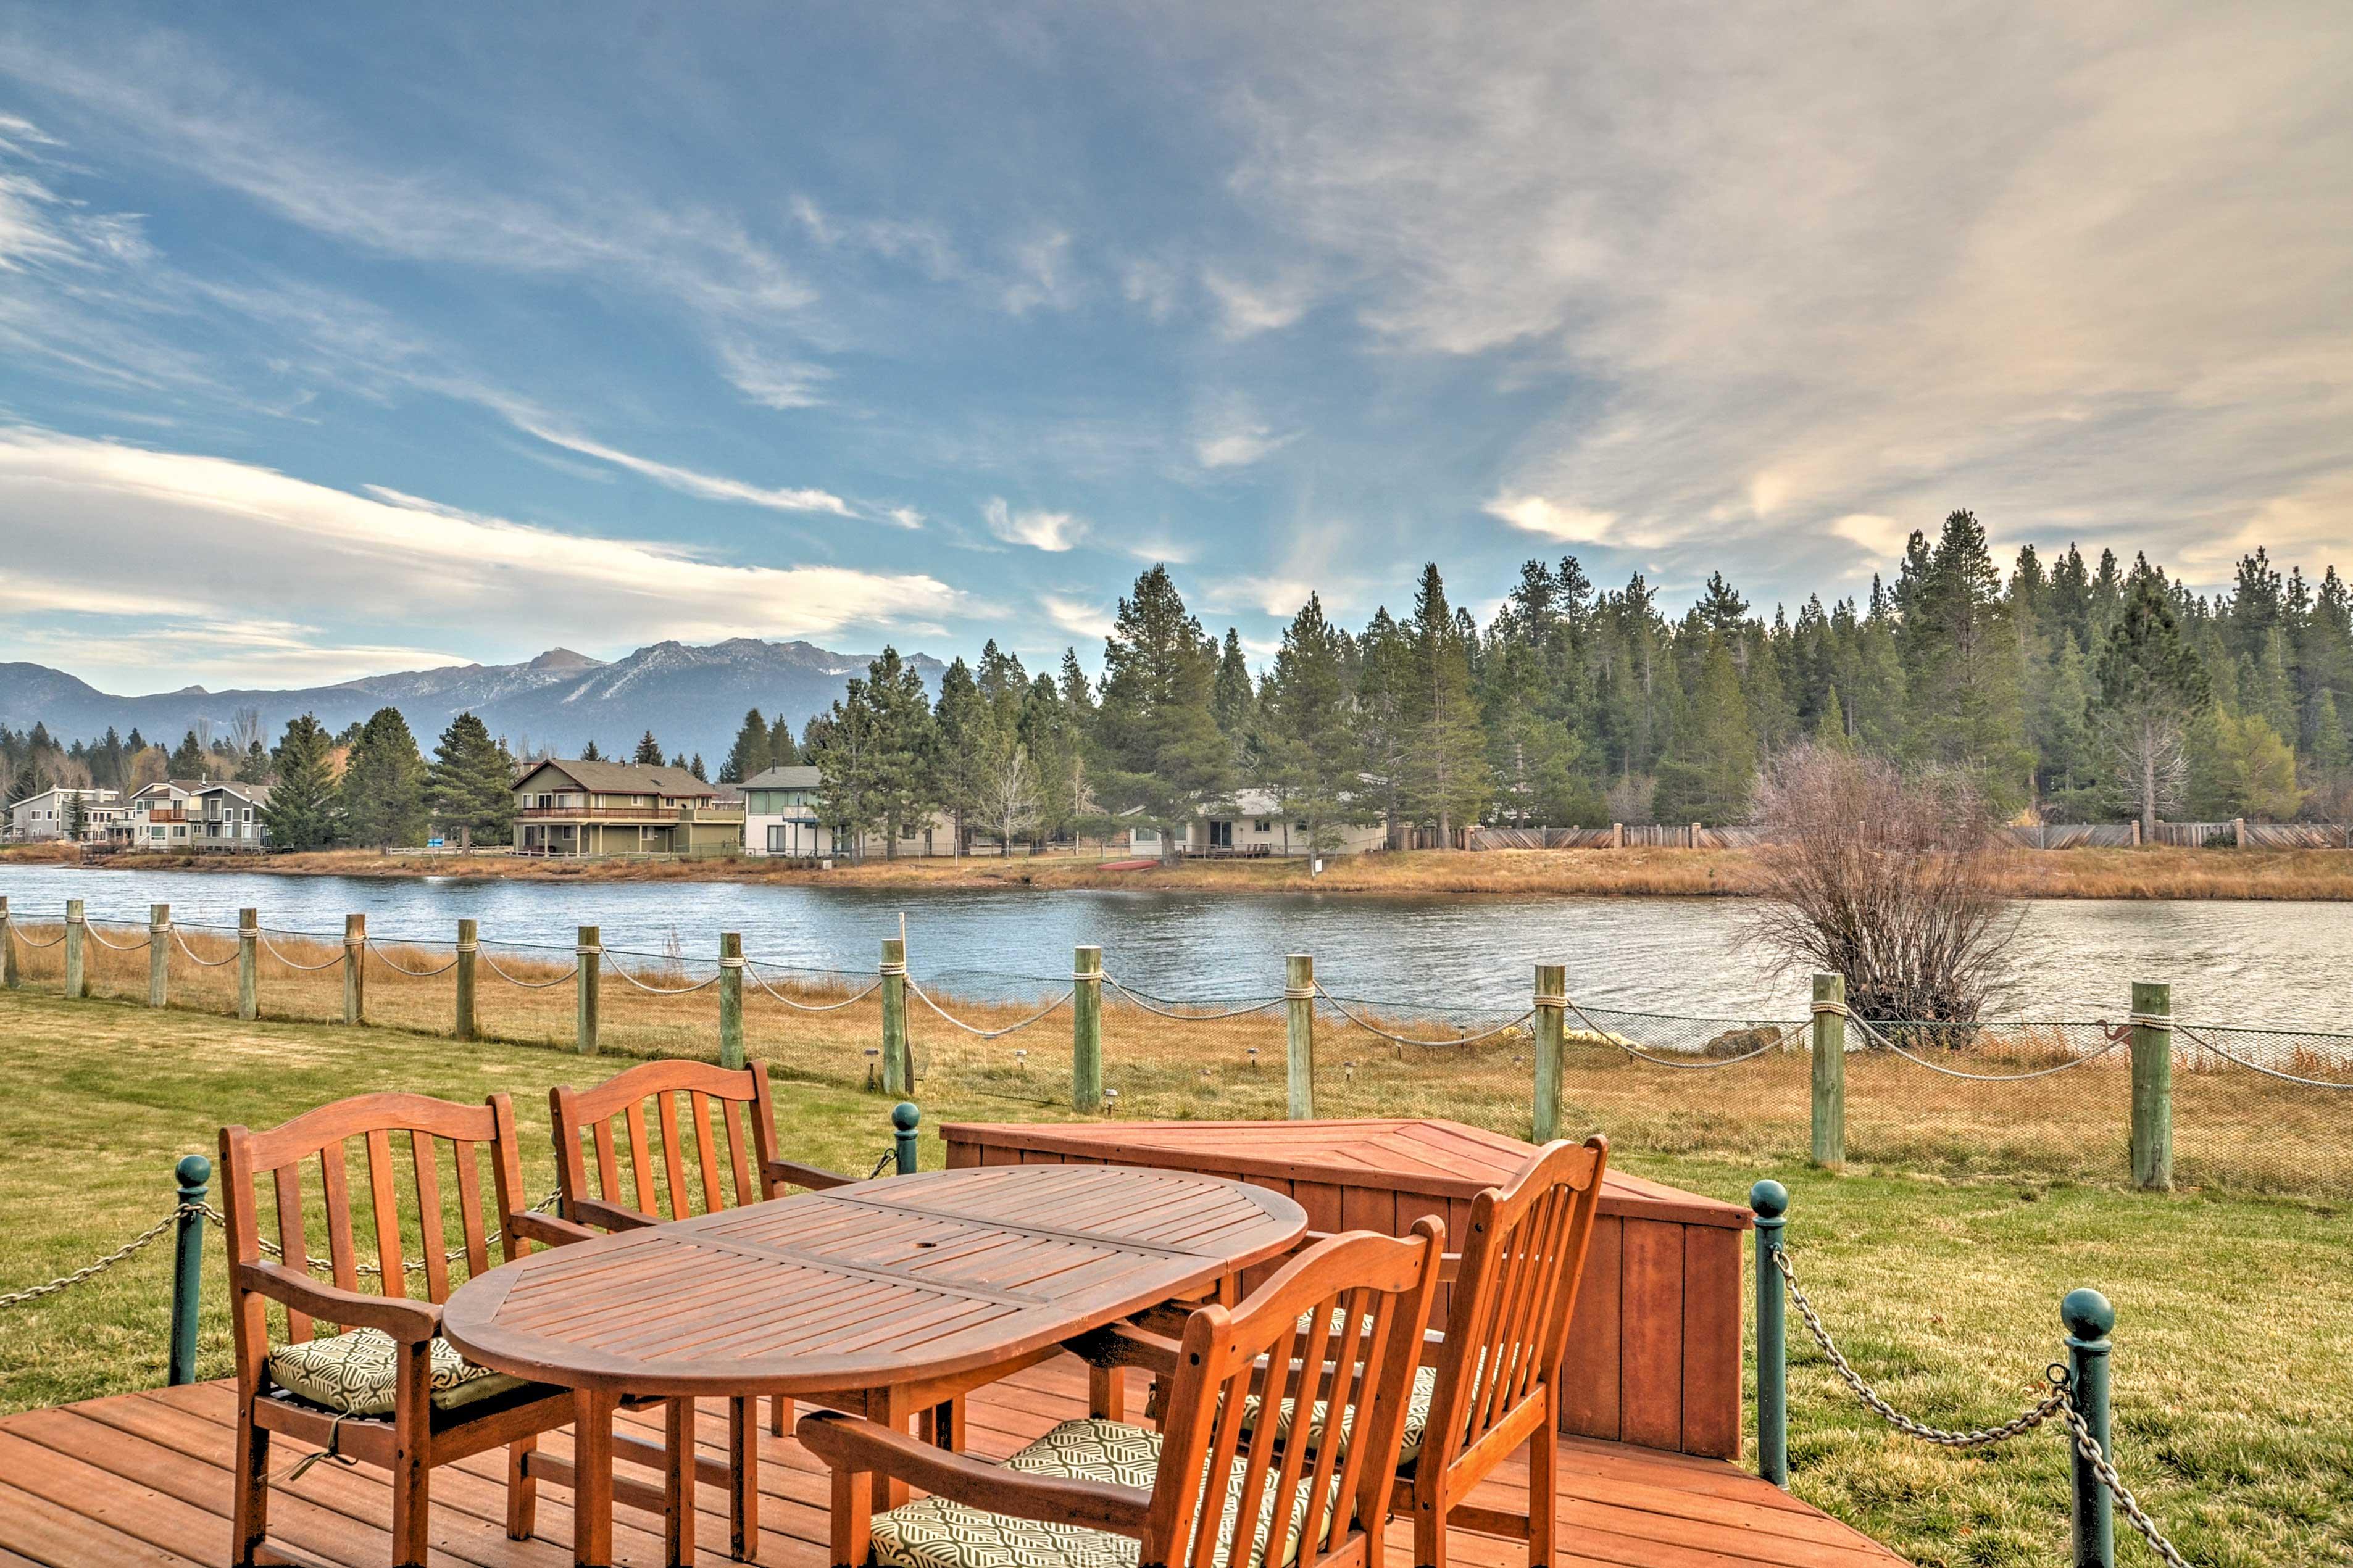 Stunning scenery awaits around every corner at this South Lake Tahoe home.